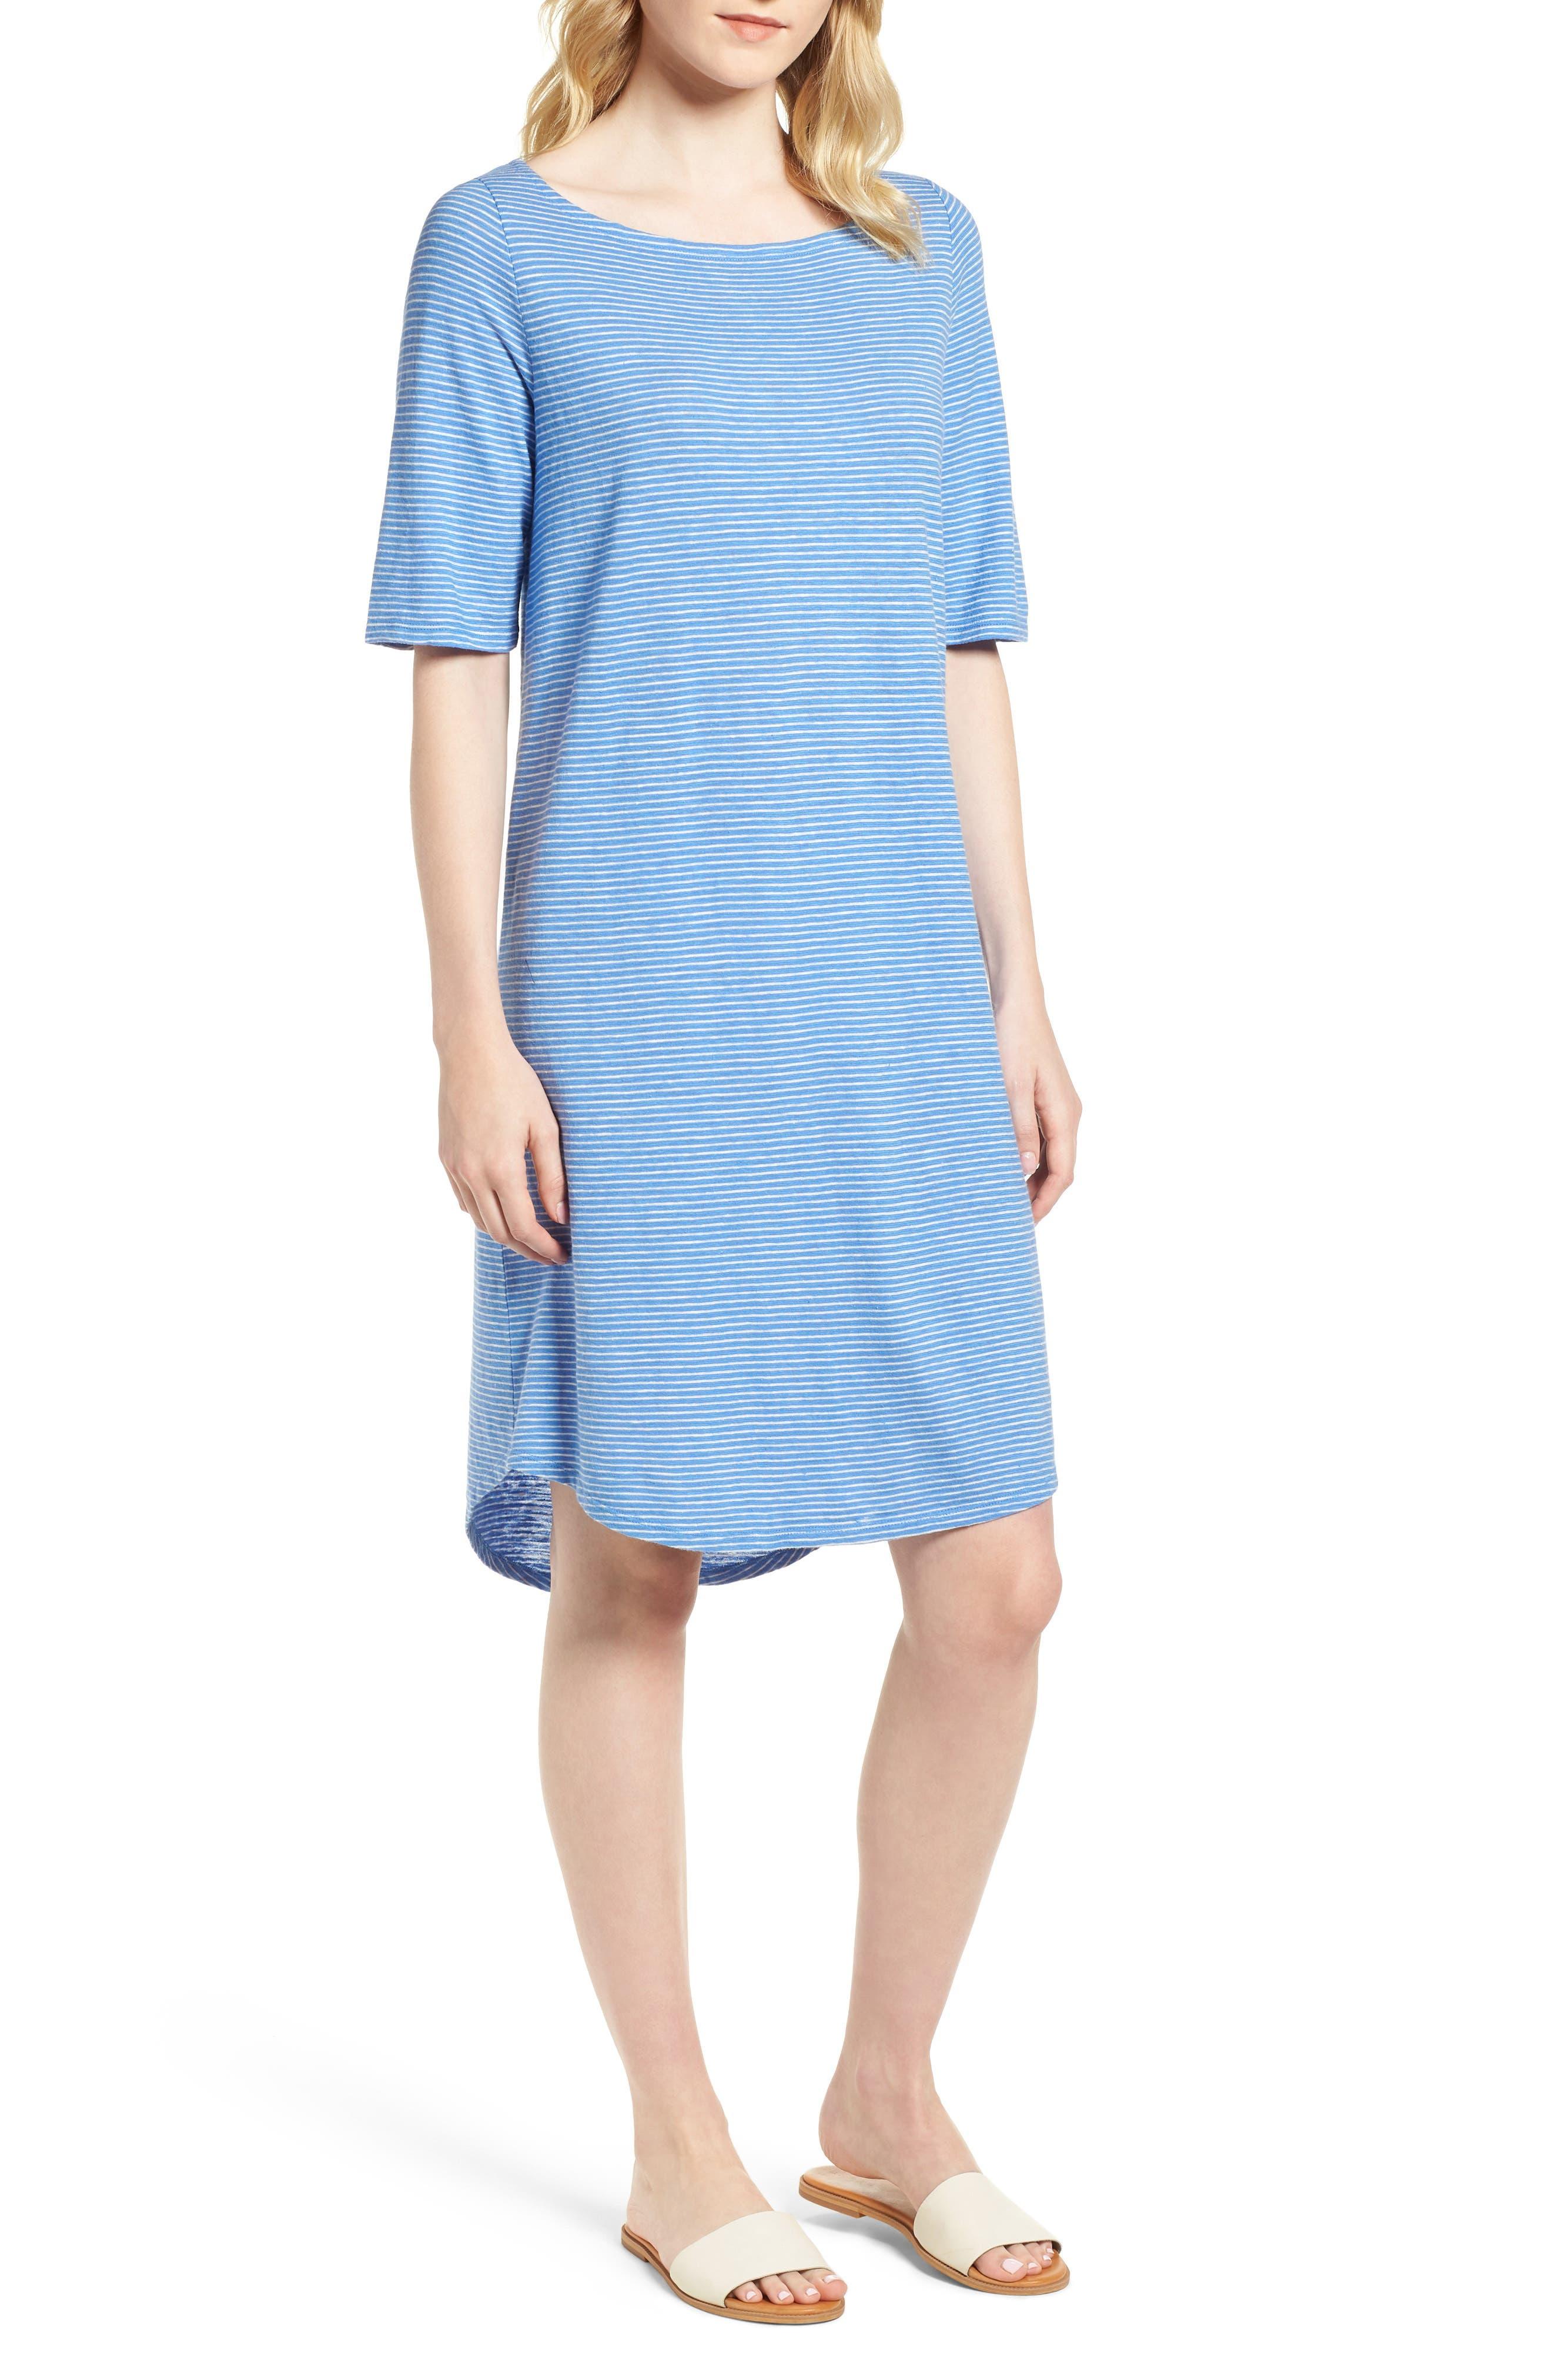 Hemp & Organic Cotton Jersey Dress,                             Main thumbnail 1, color,                             Bluebell